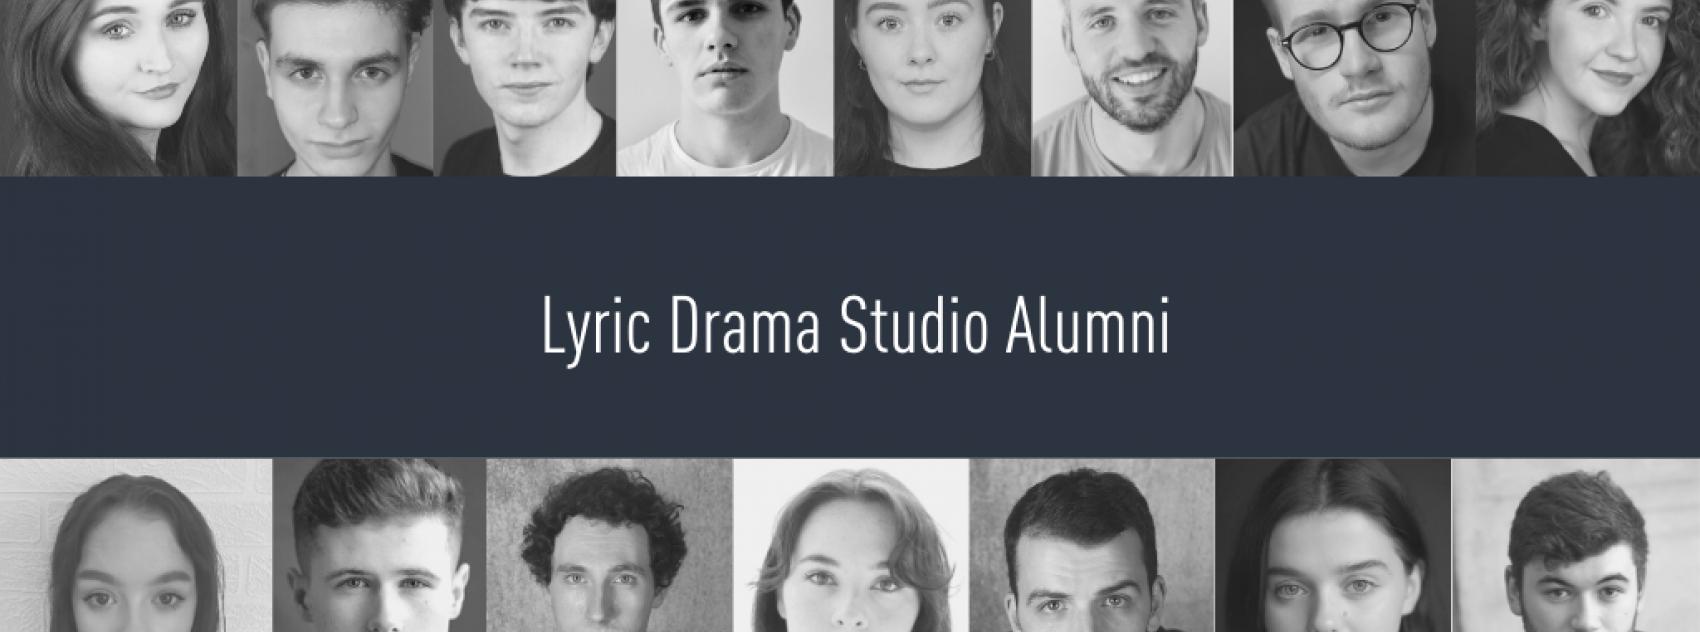 Drama Studio Alumni 2019 2020